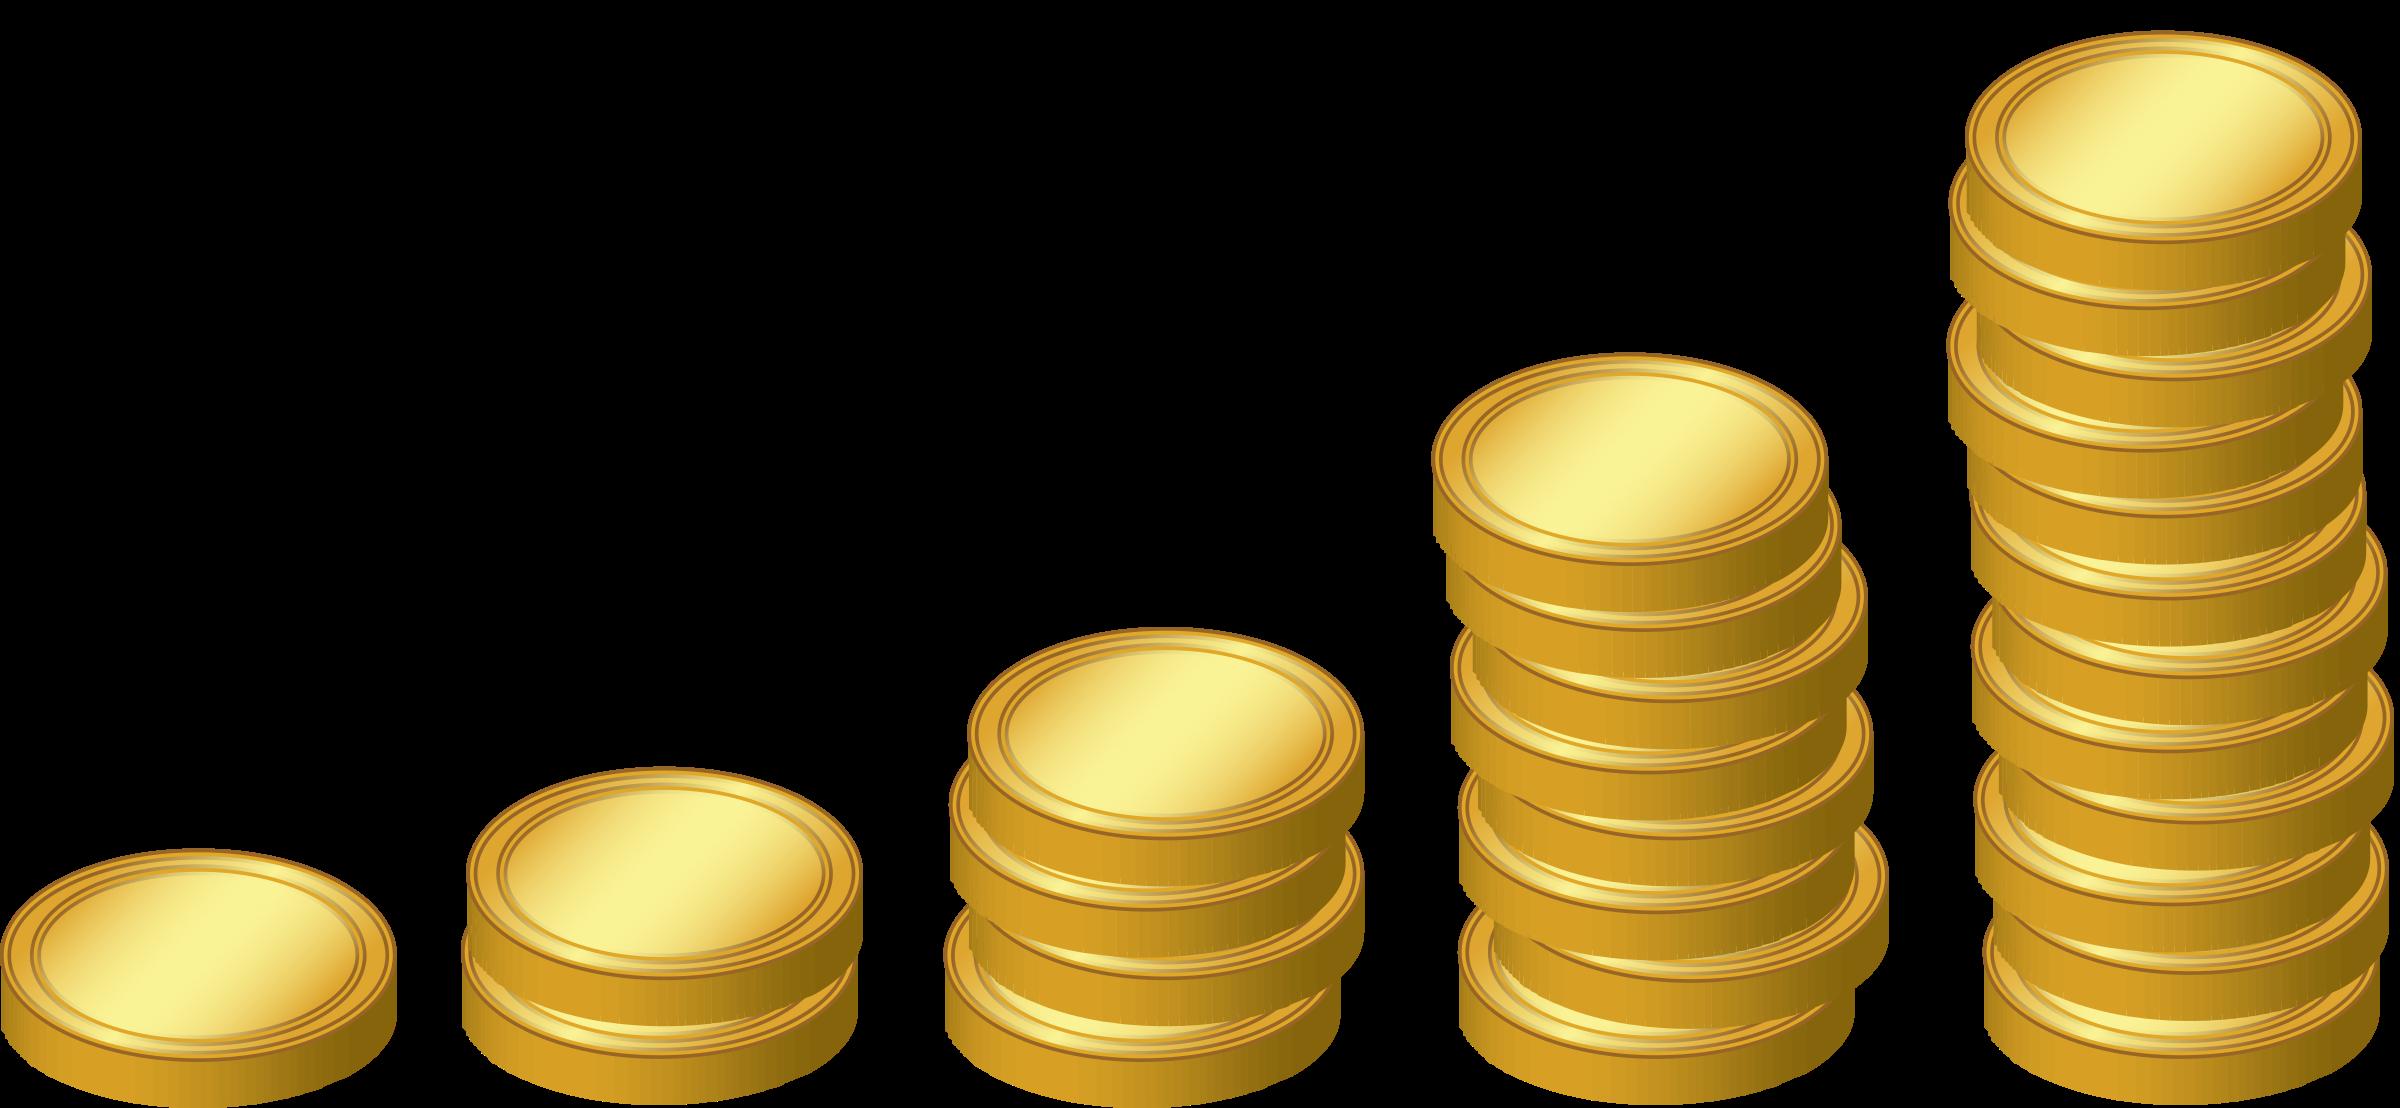 coin finances huge. Conflict clipart intere